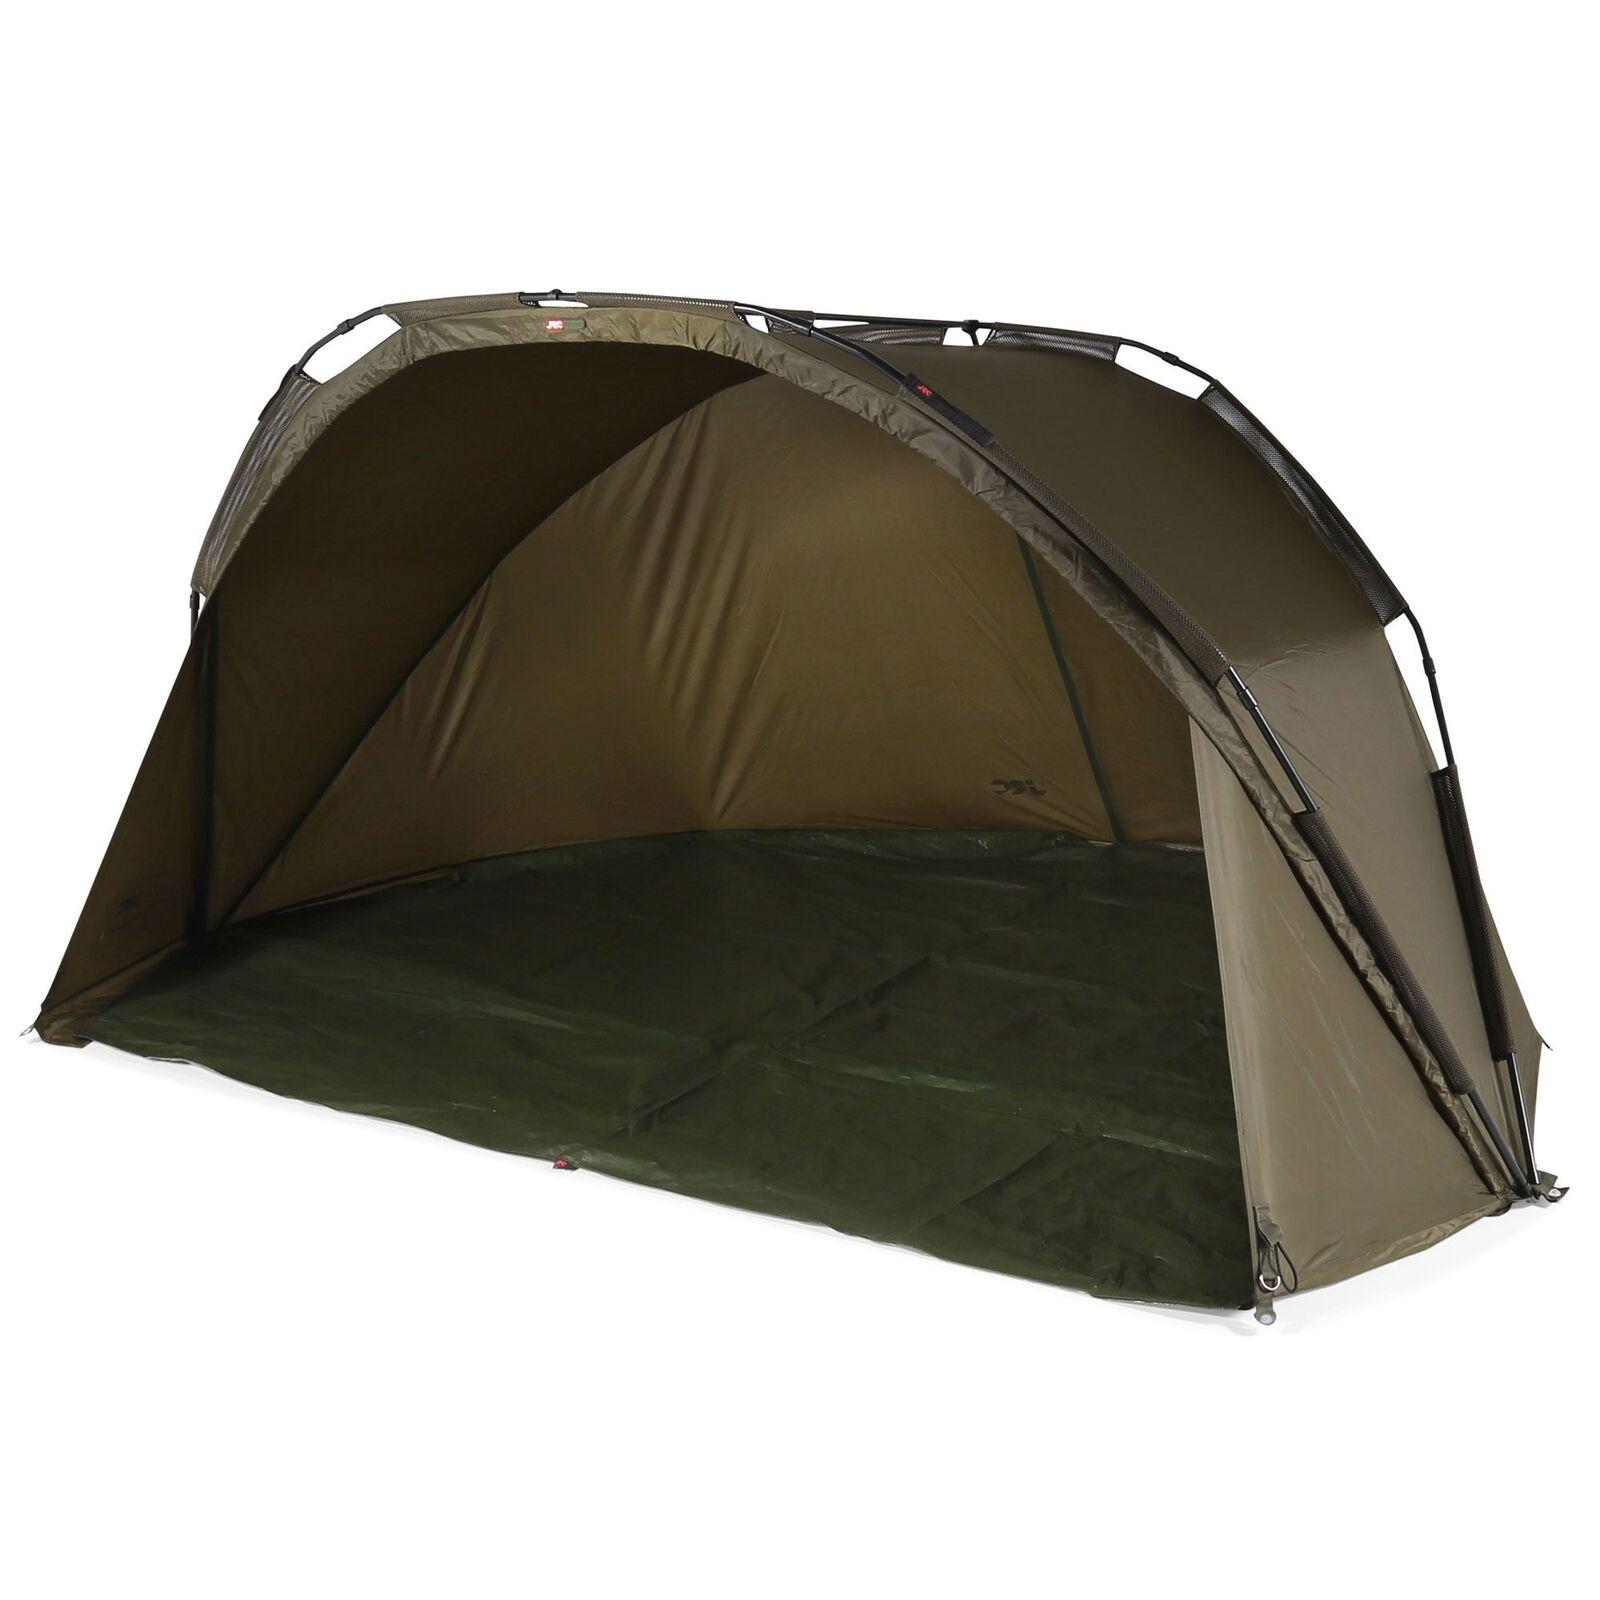 JRC Defender Shelter Angelzelt Karpfenzelt 200x280x135cm 5000mm Alu Rahmen